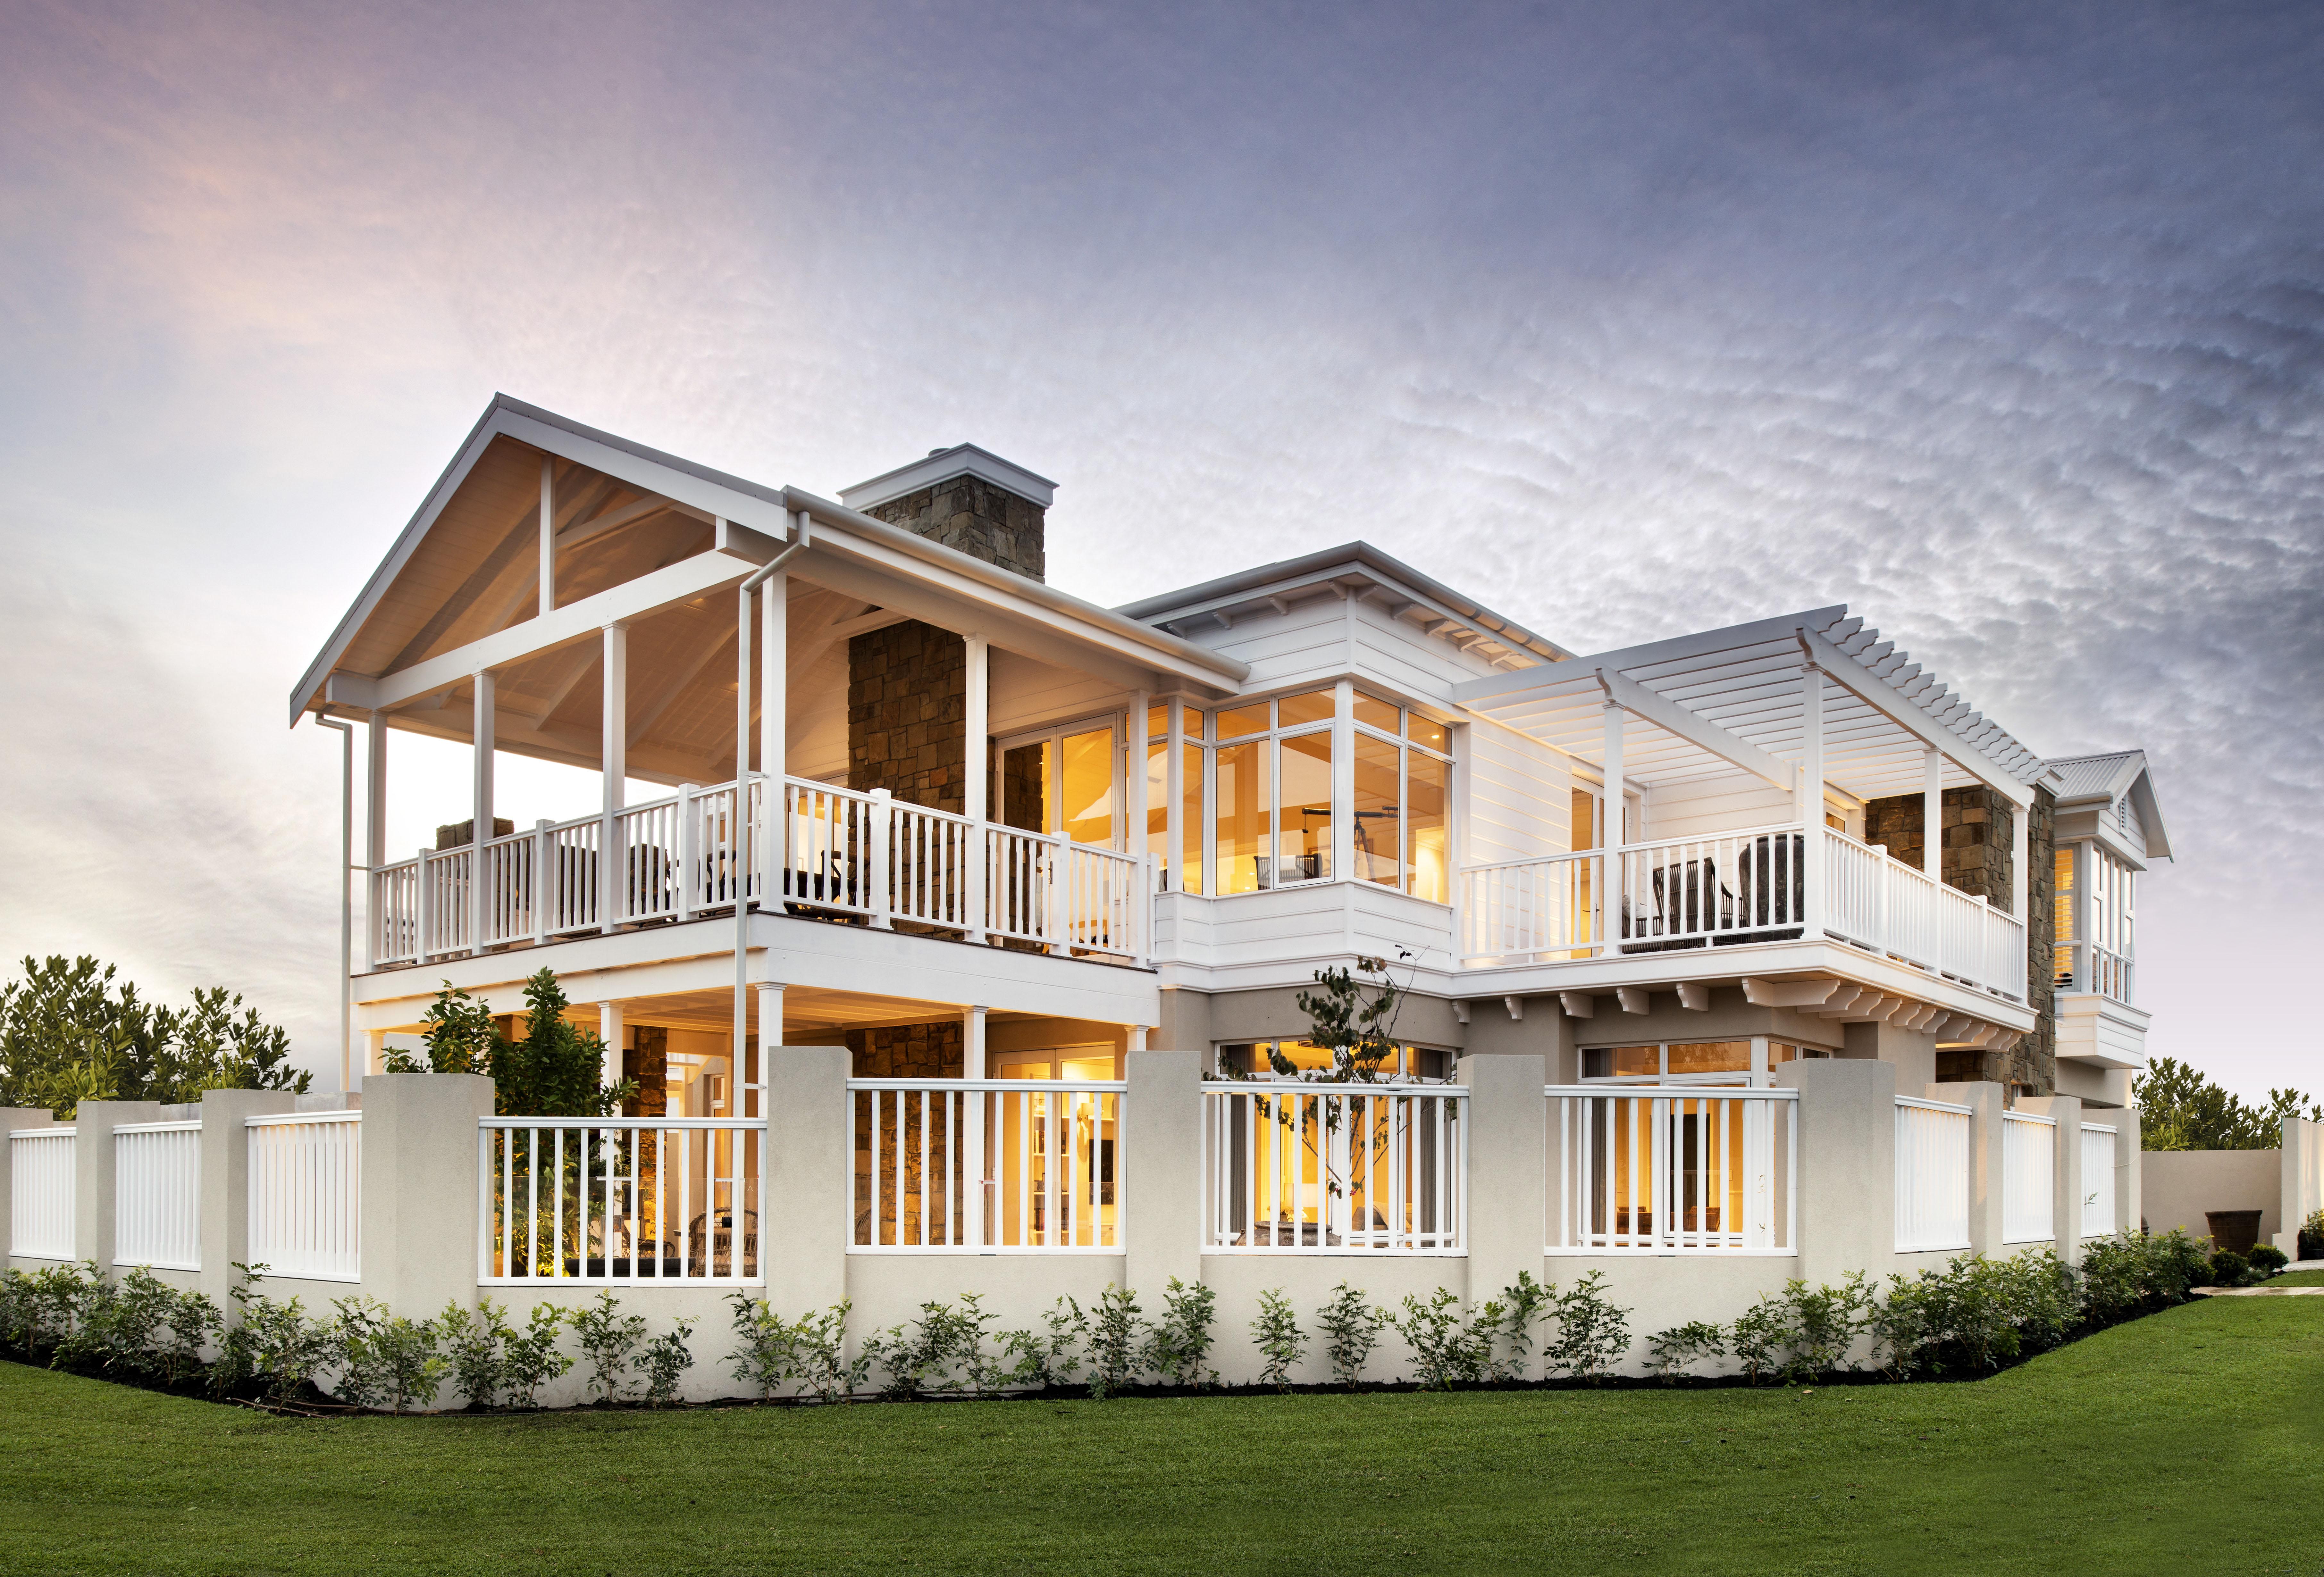 The grayson custom home by webb brown neaves for Grayson home